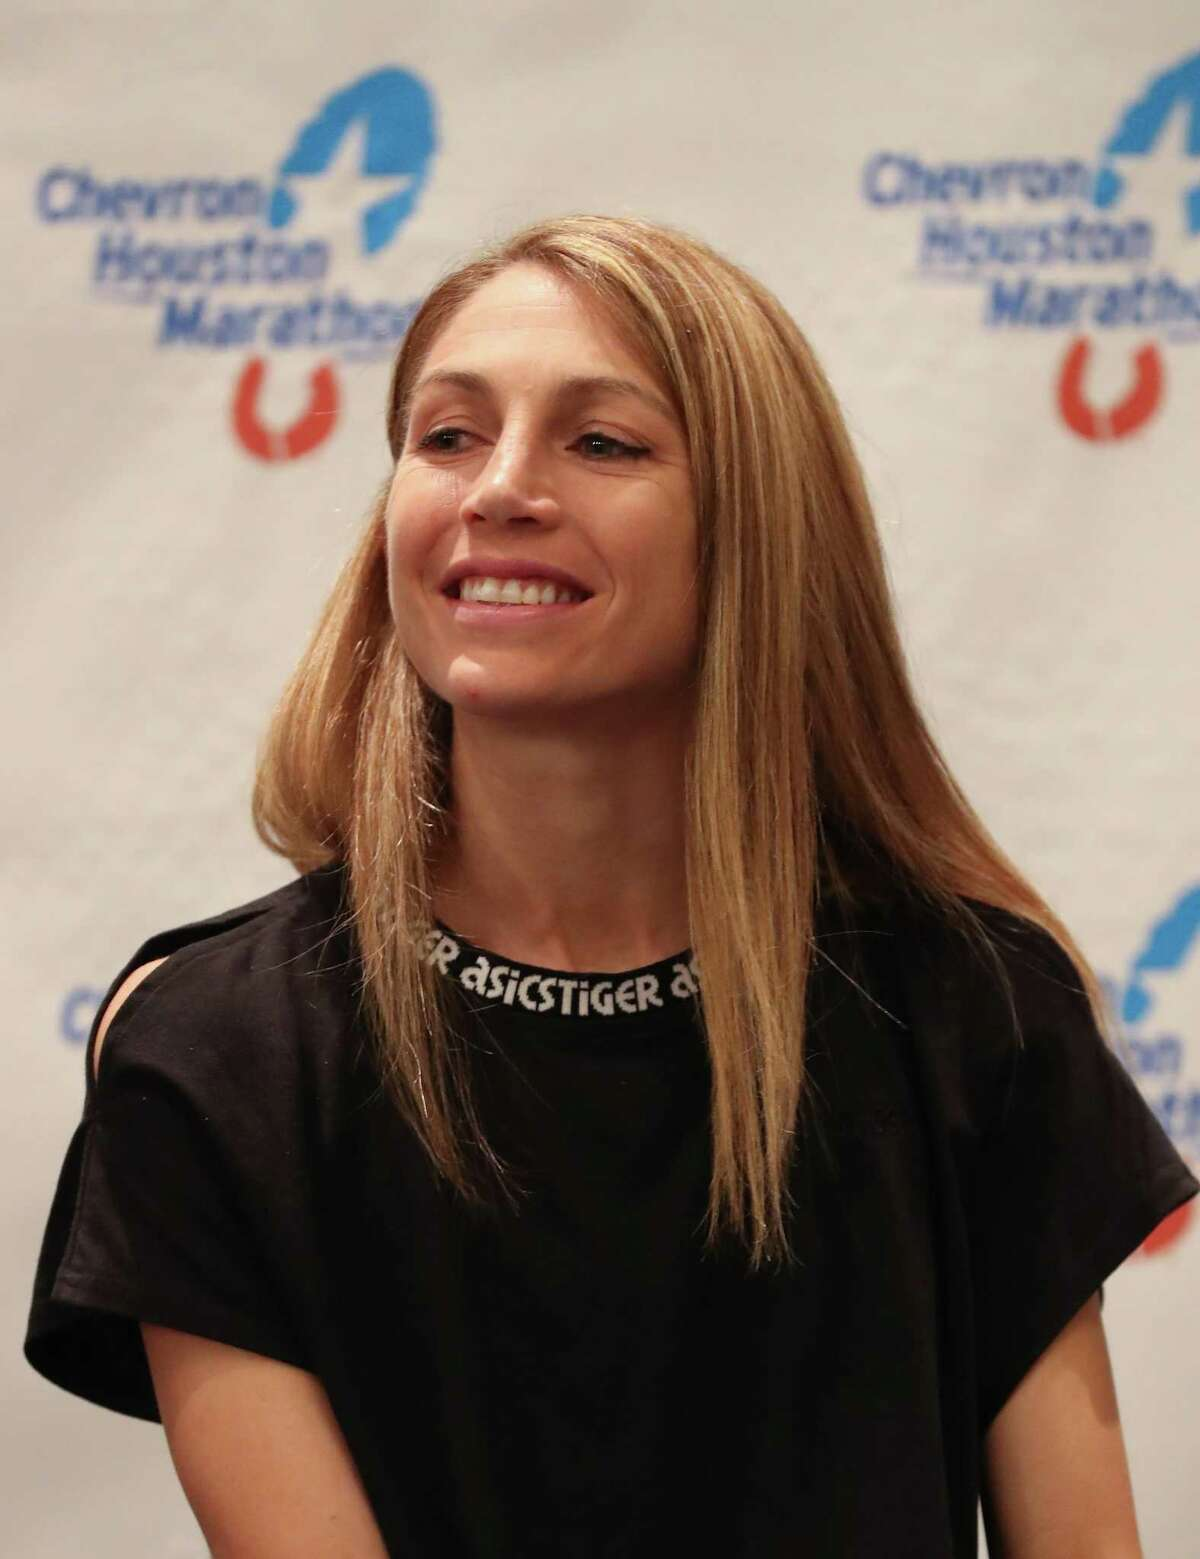 Sara Hall will be running in the Chevron Houston Half Marathon Friday, Jan. 17, 2020, in Houston.